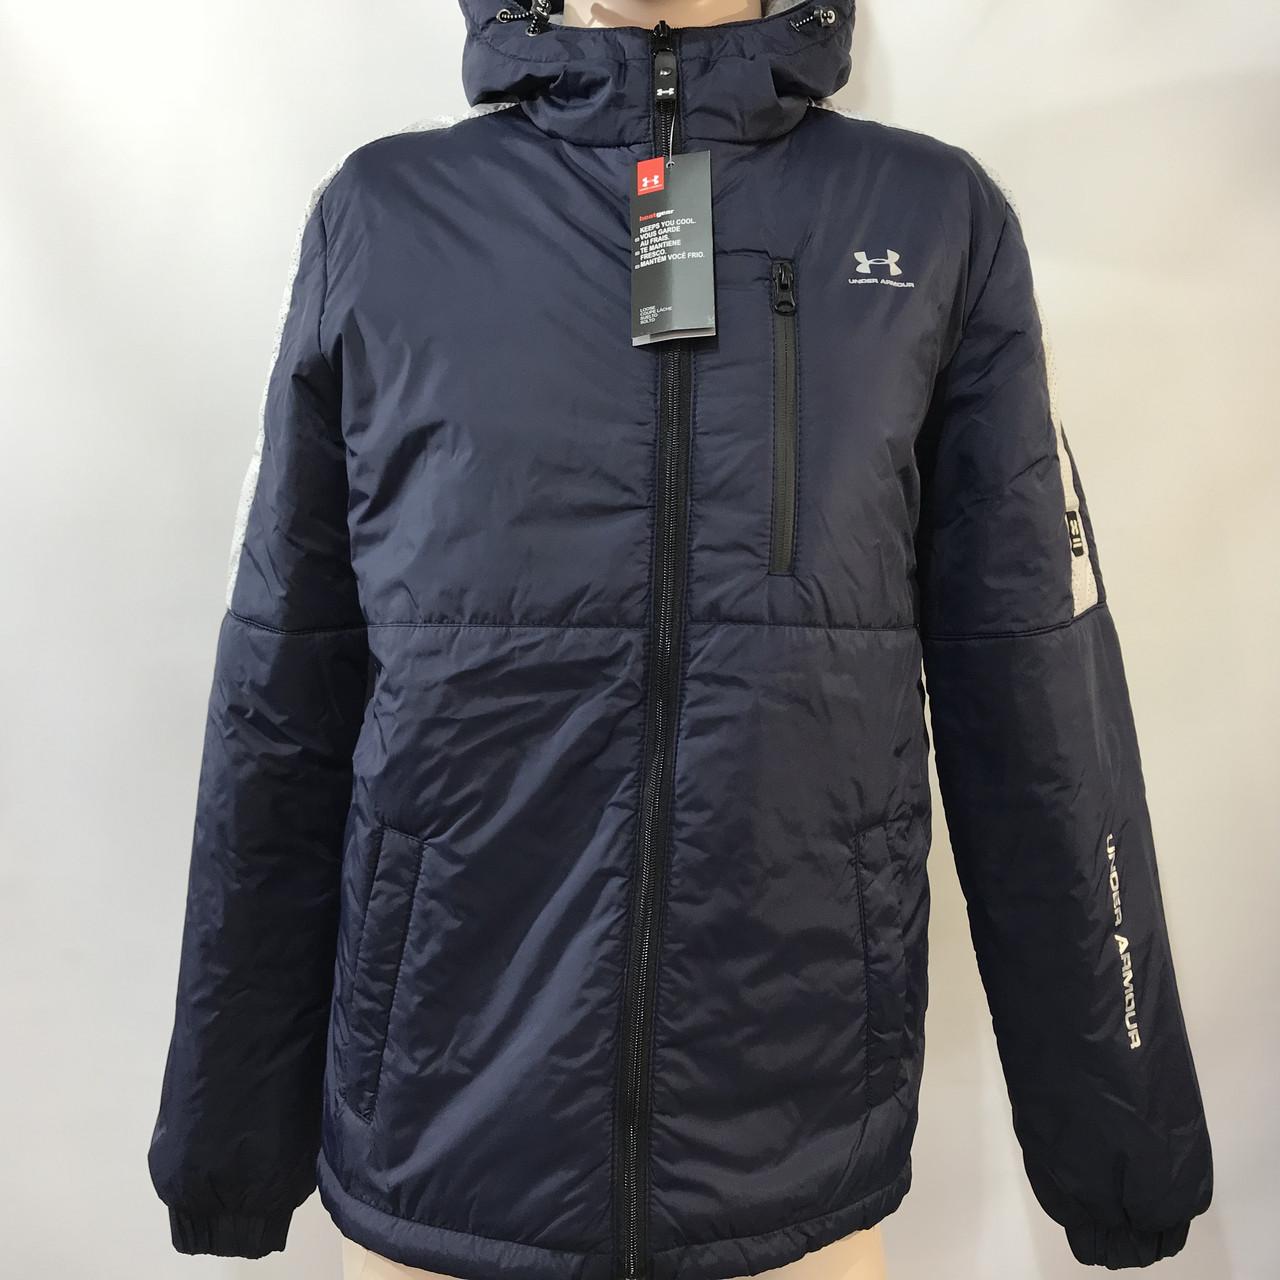 Куртка мужская / демисезонная на тонком синтепоне темно-синяя / размер M, L